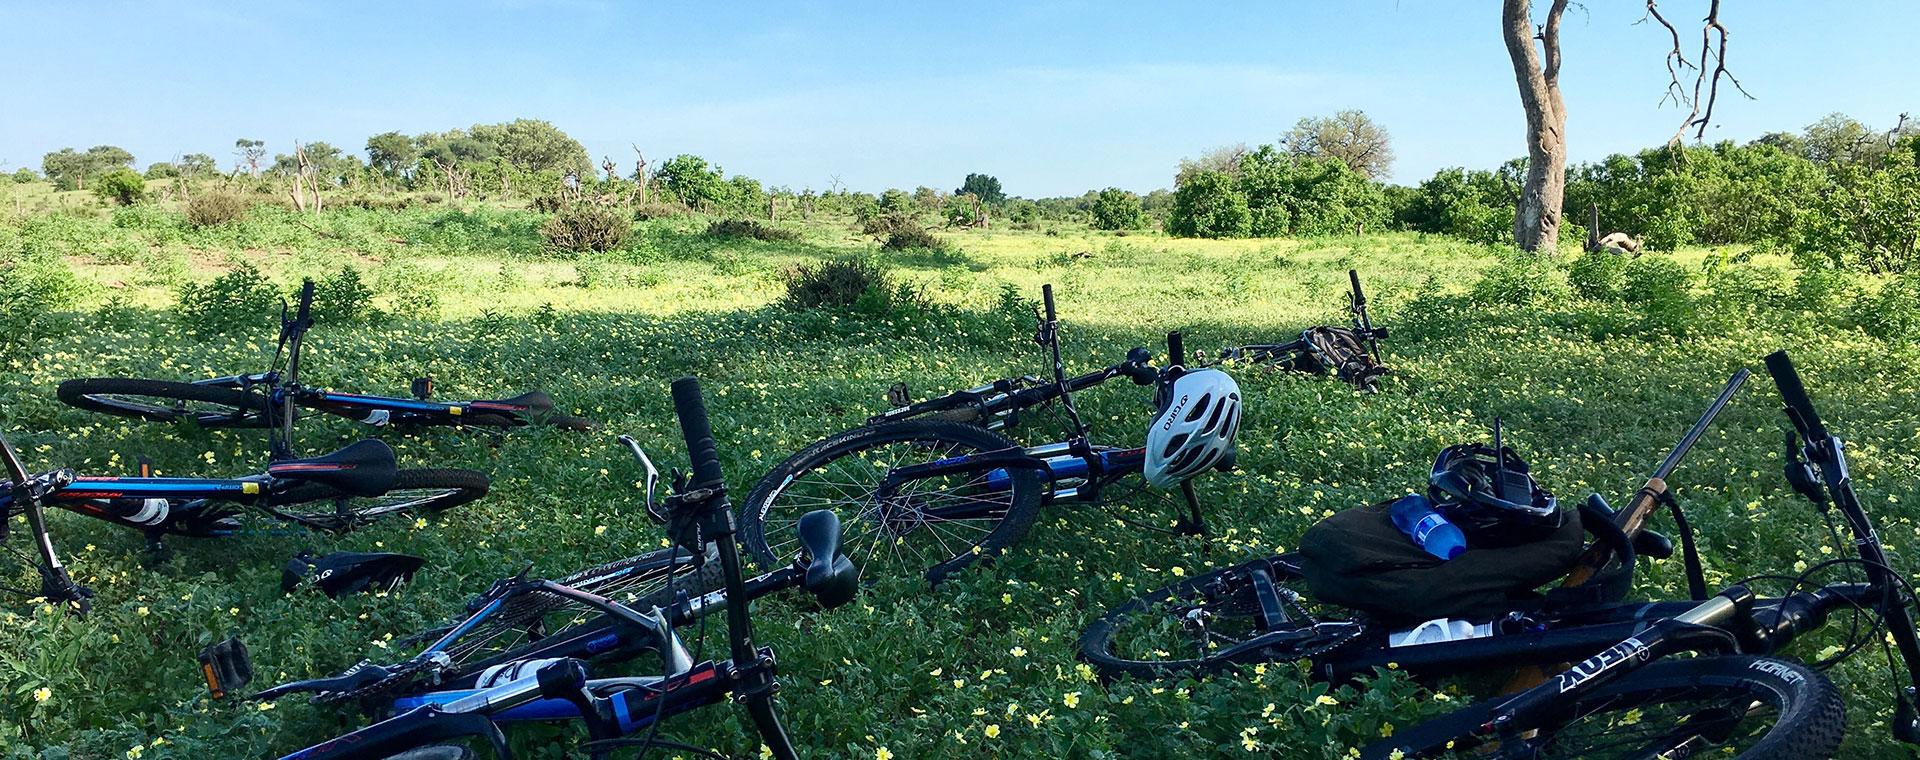 wild-bikes